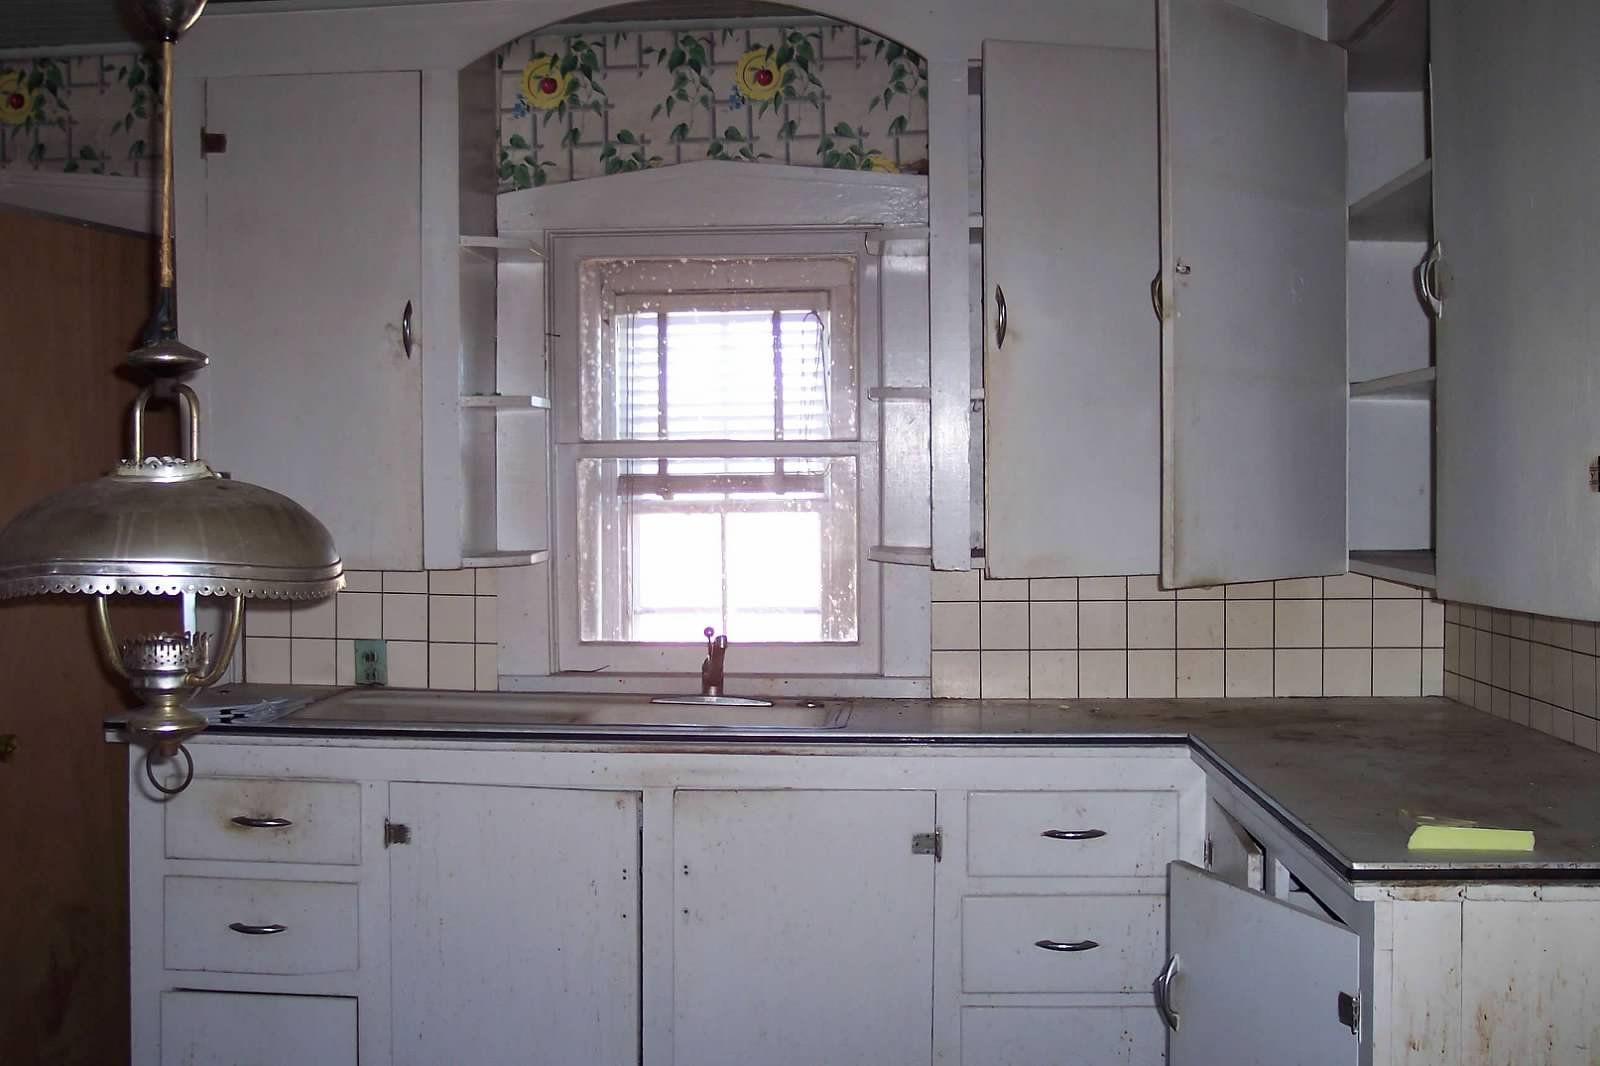 Warrington House Pictures Kitchen Cabinet Styles 1930s Kitchen Kitchen Cabinets